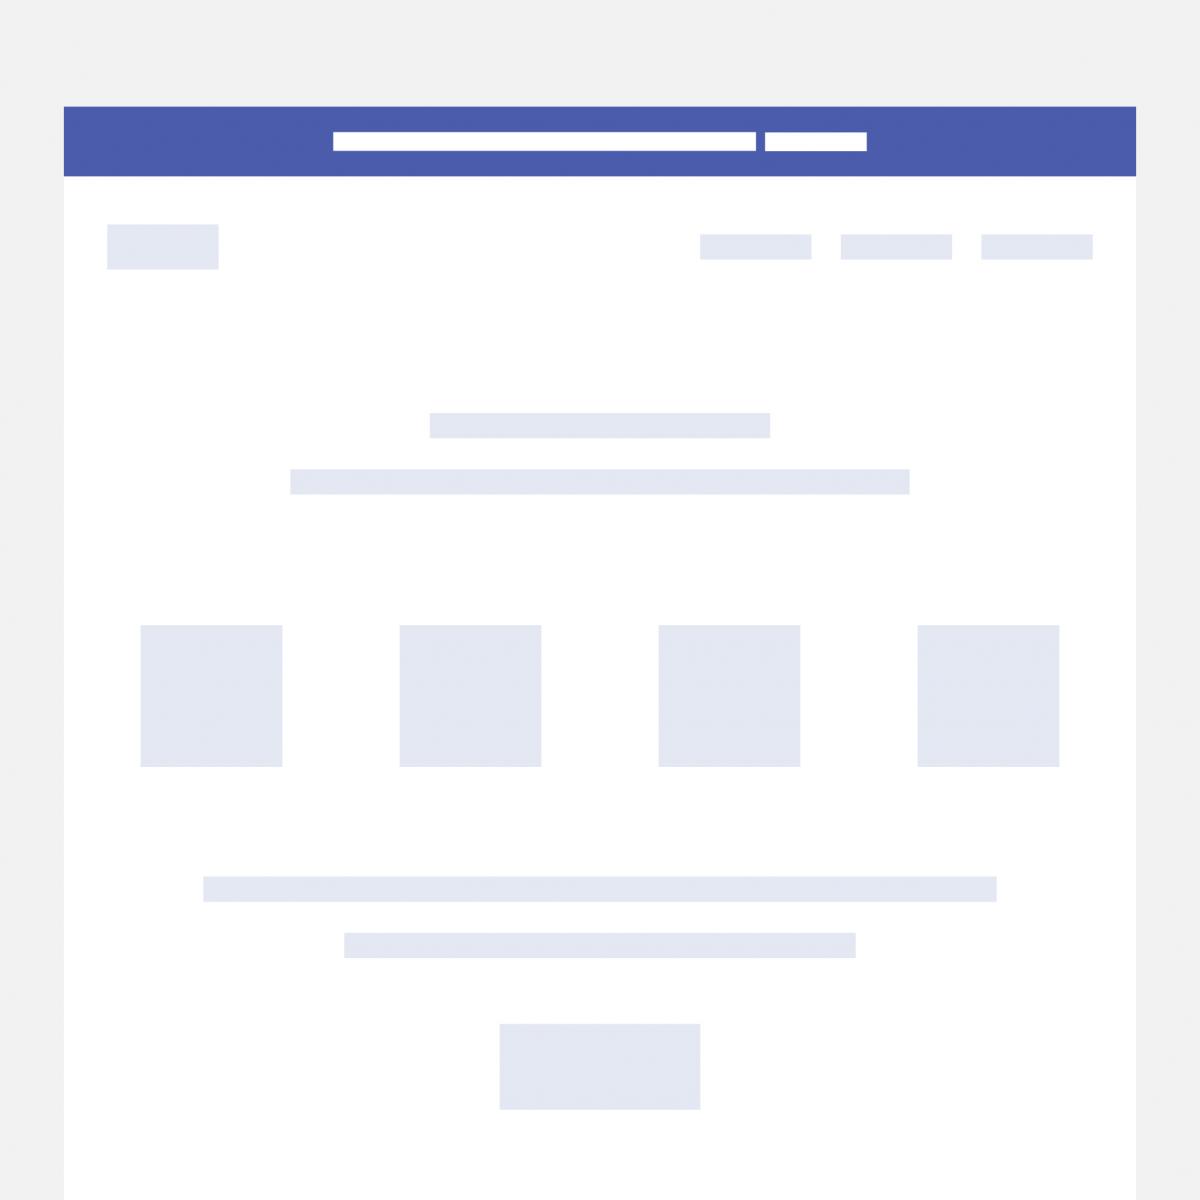 Shopify announcement bar